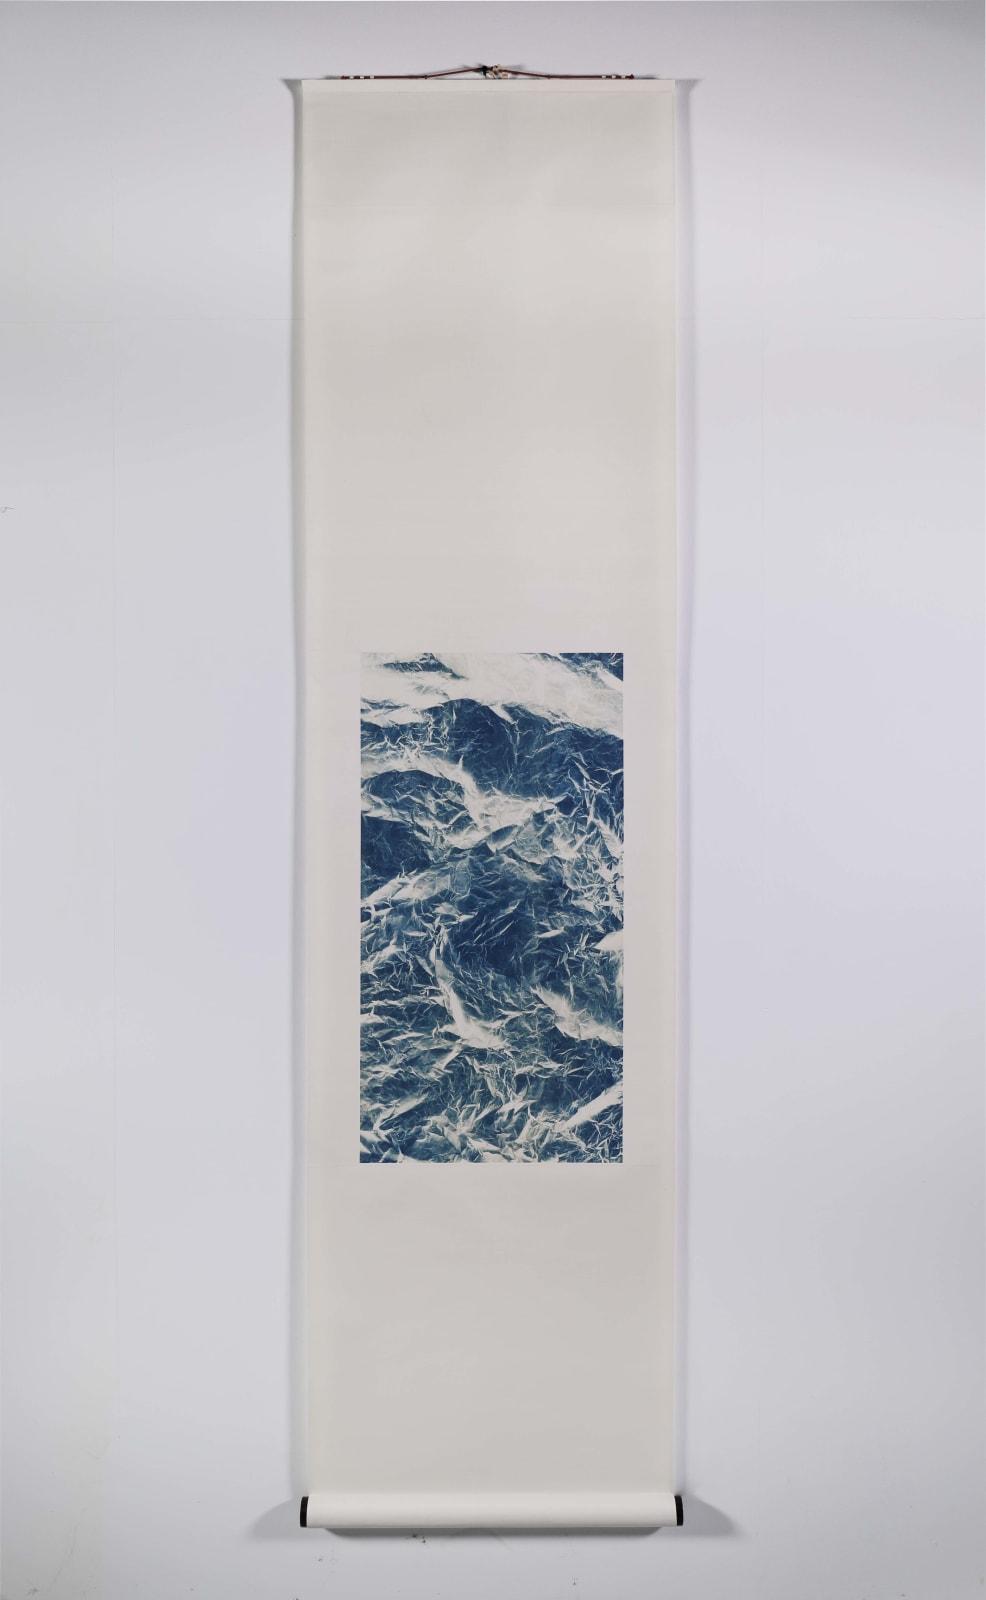 Wu Chi-Tsung 吳季璁, Wrinkled Texture 059 皴法習作之五十九, 2019